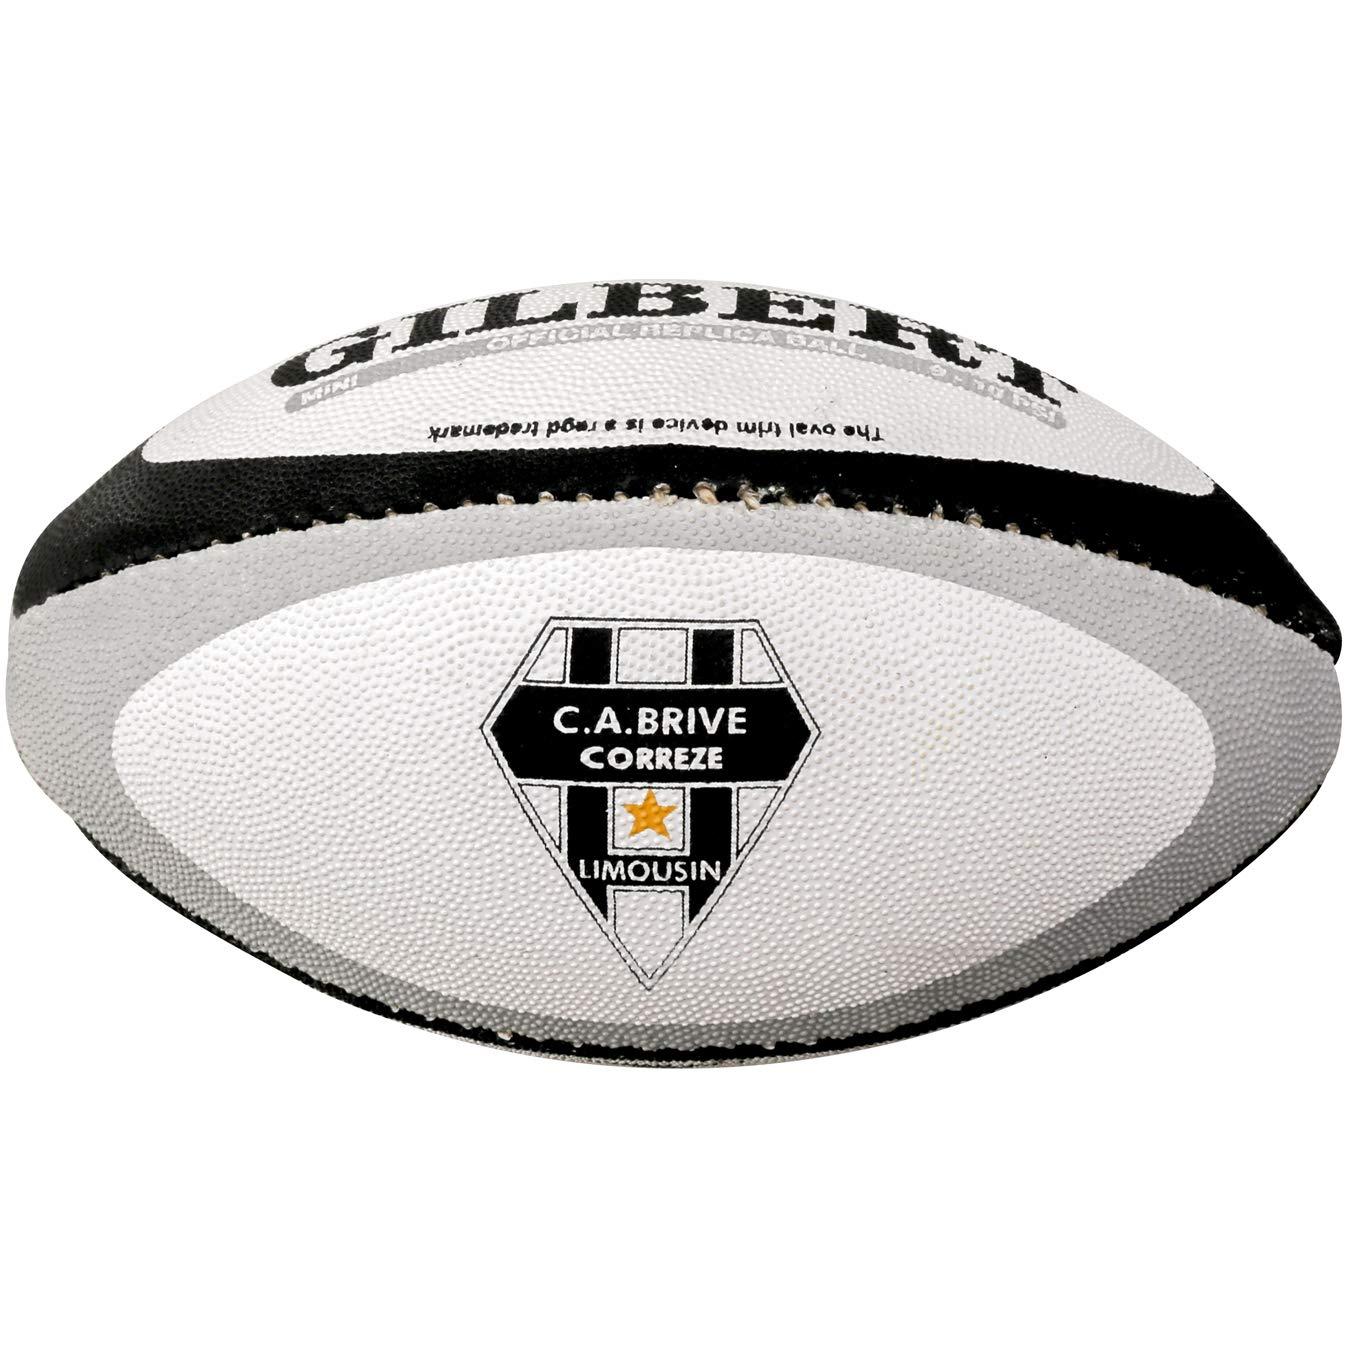 Gilbert Ballon Rugby - Brive - Mini